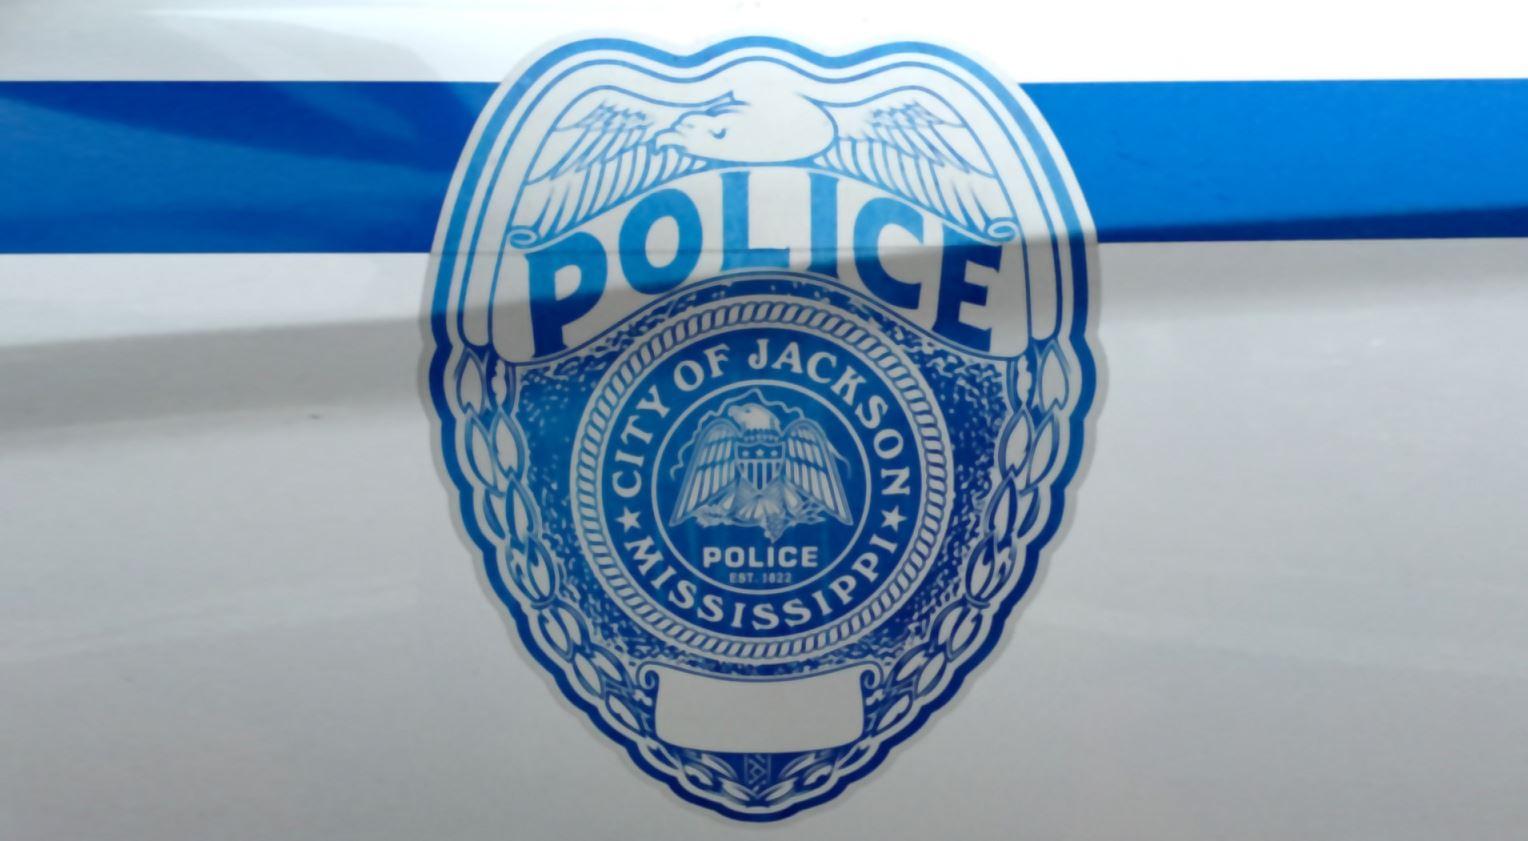 JACKSON POLICE_1532035681801.JPG.jpg